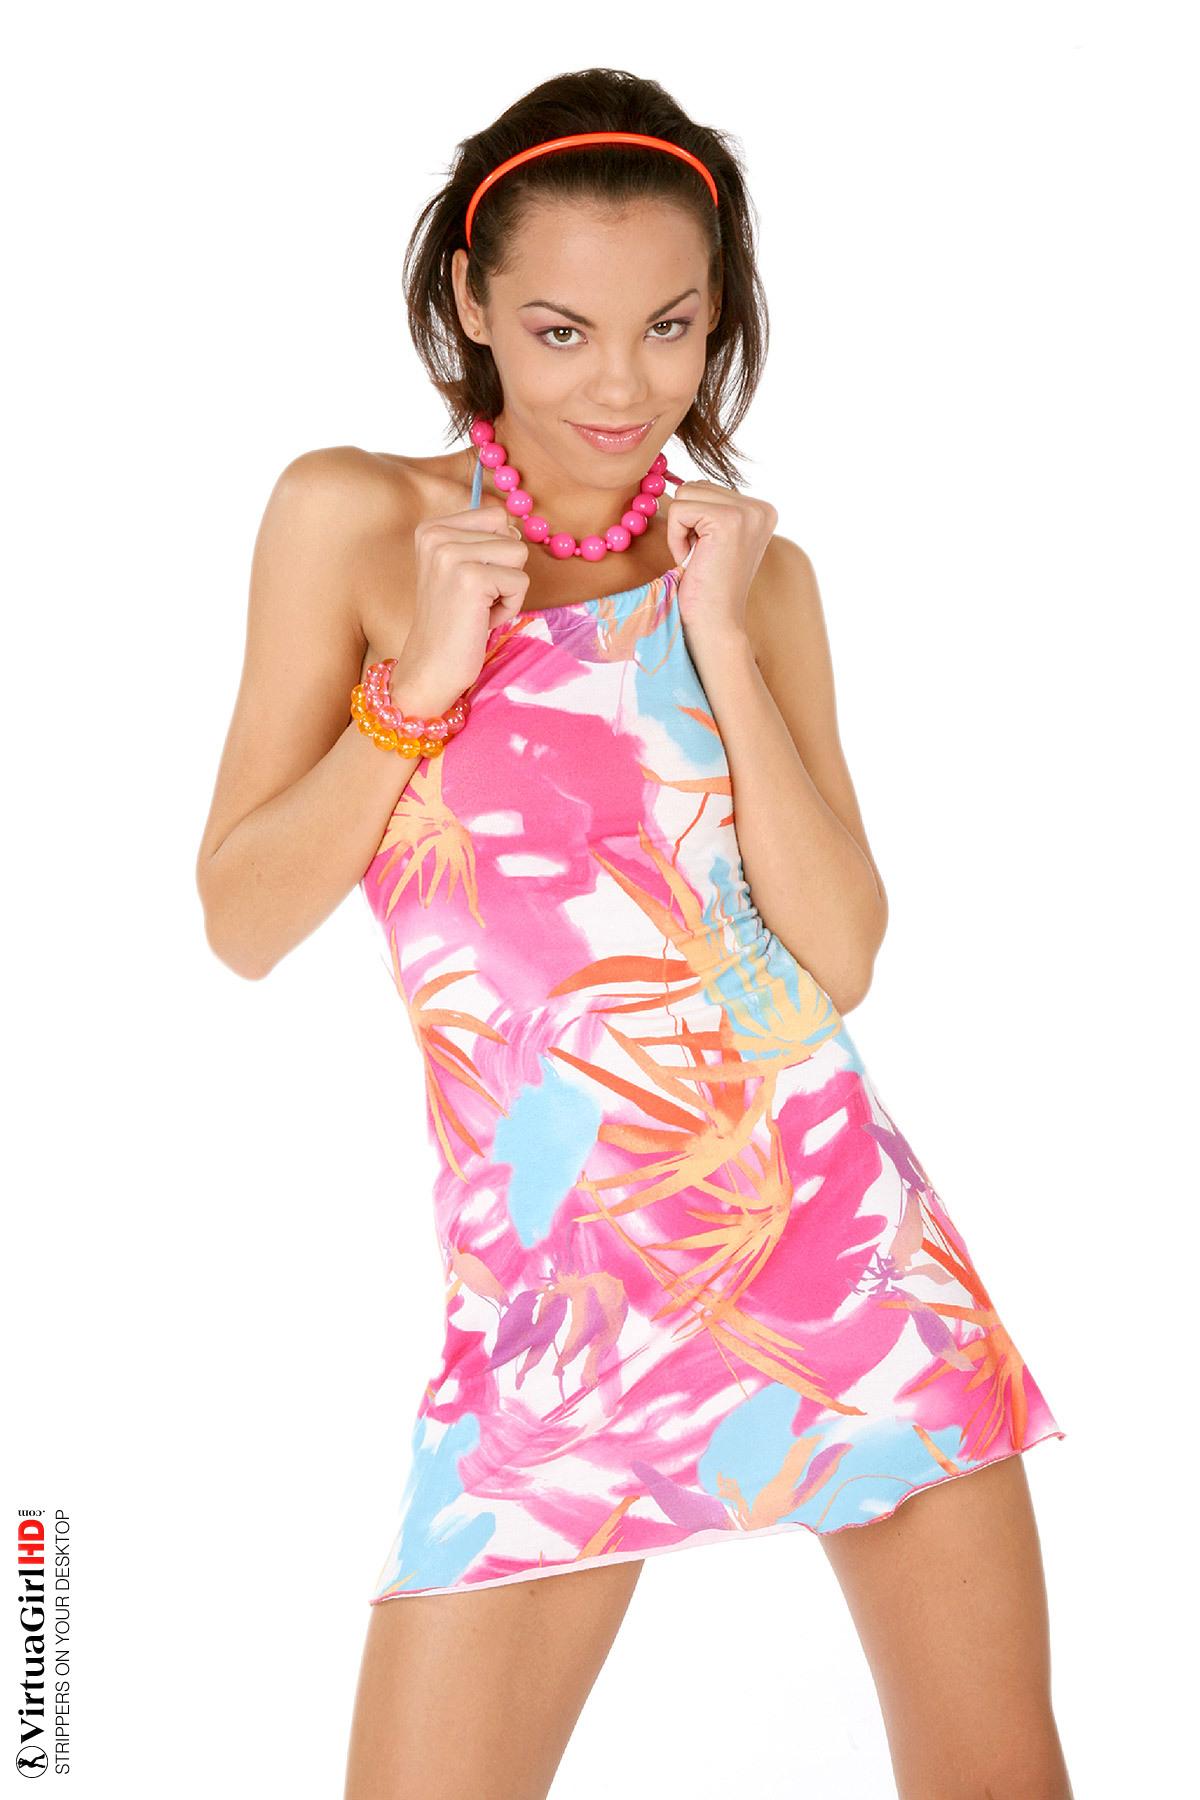 hd wallpapers nude model silvina luna hd topless